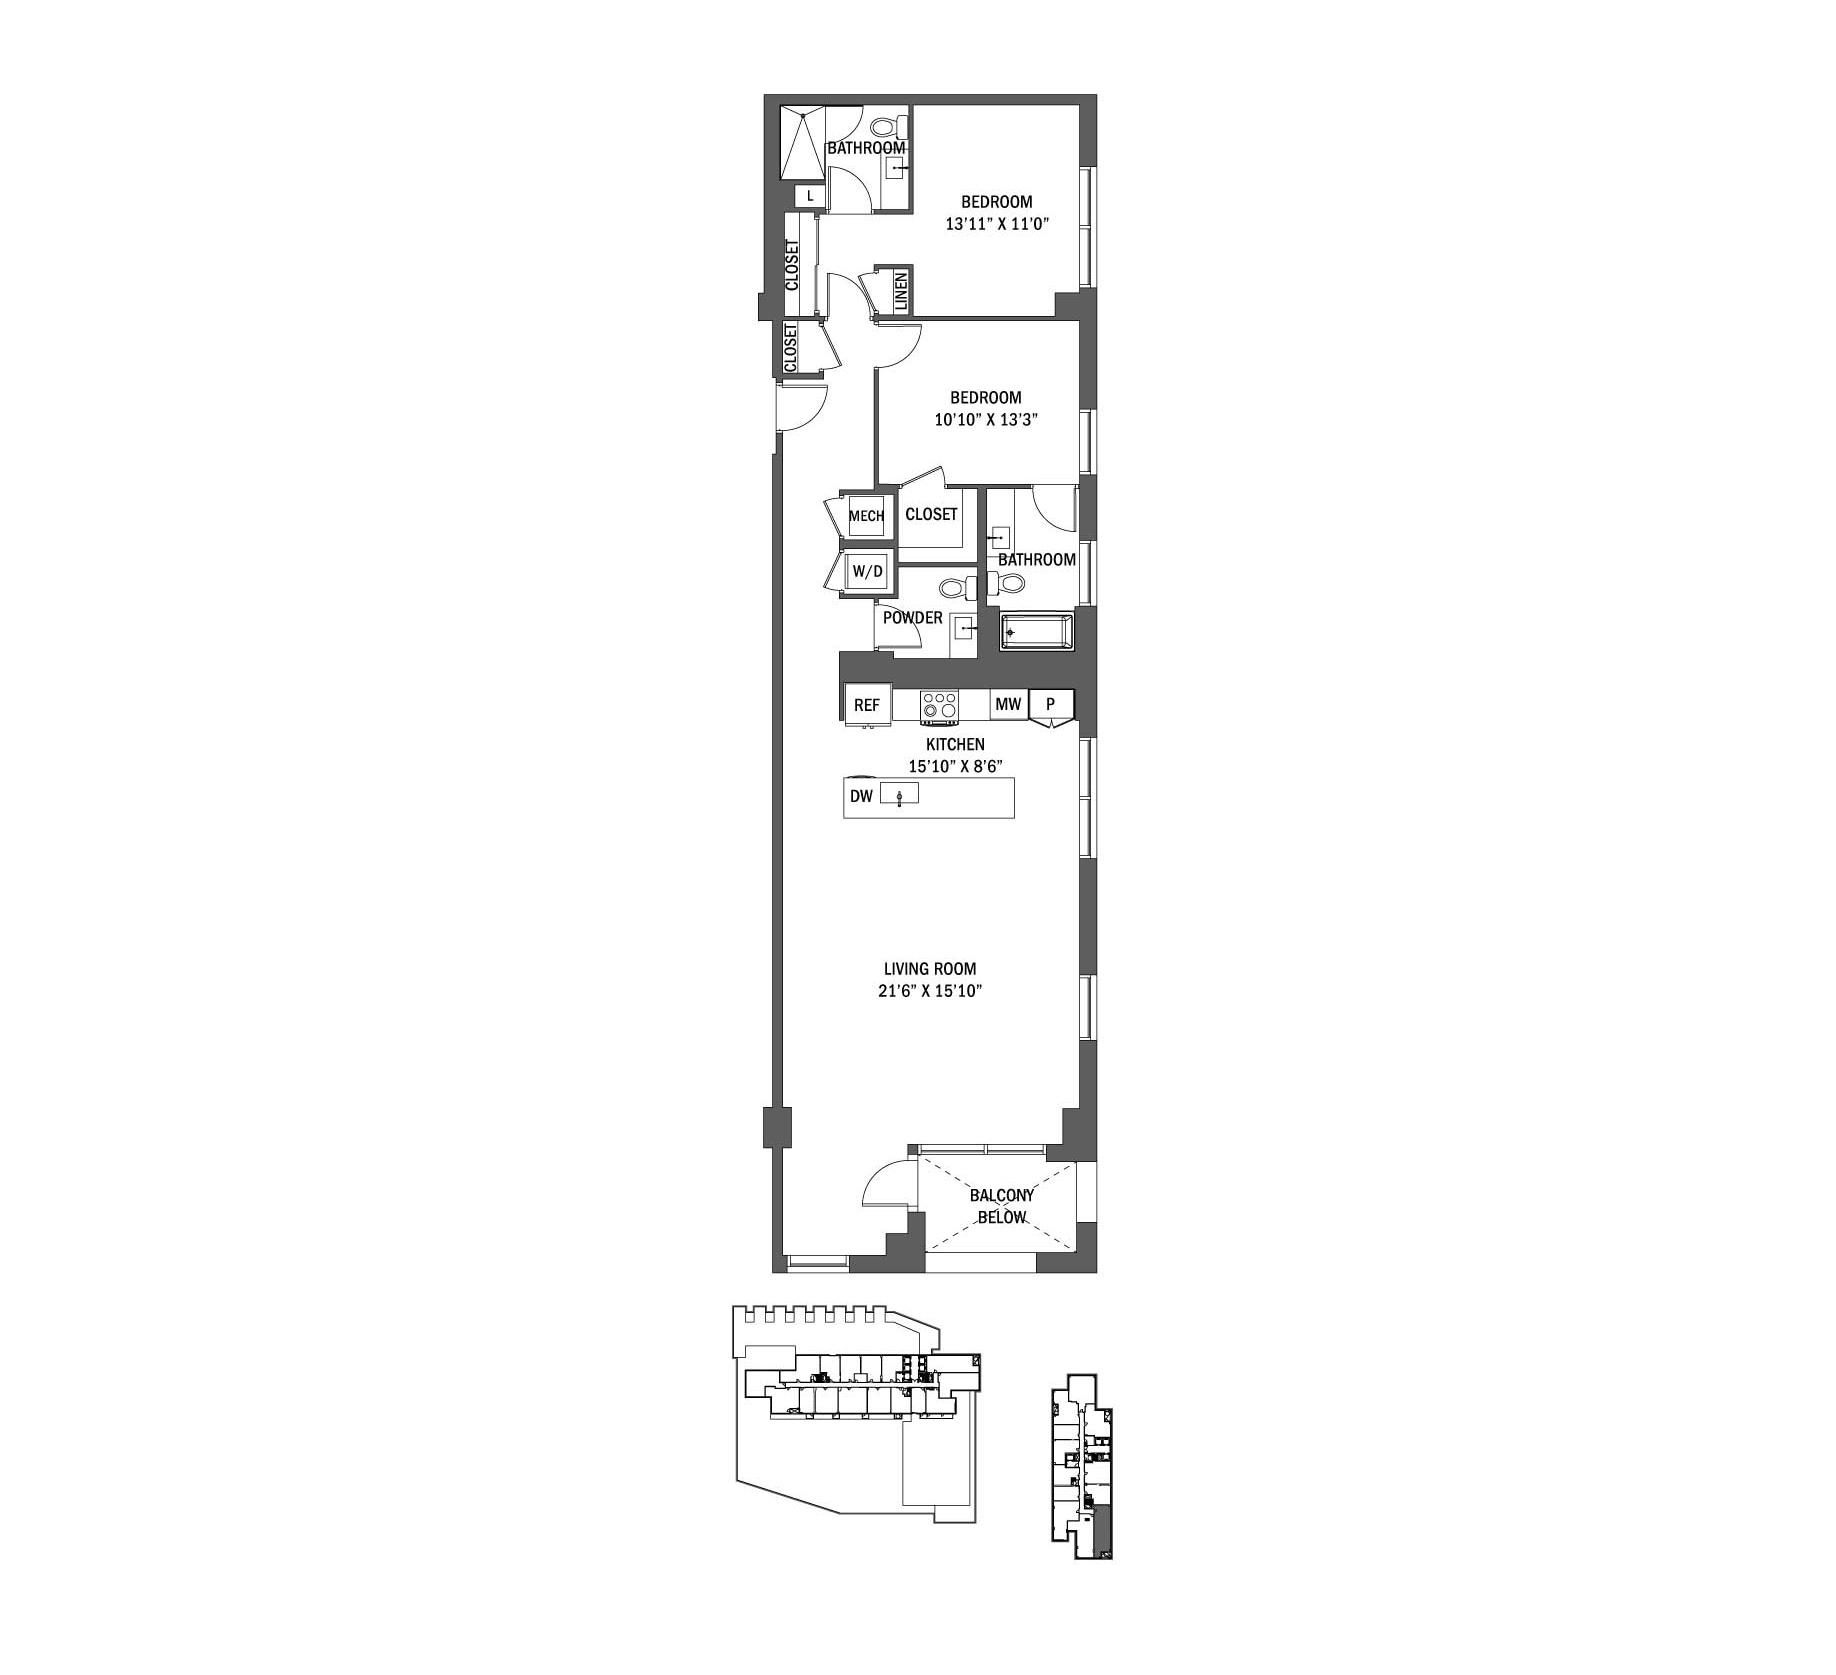 P0625338 789bc19 e10 18p 2 floorplan